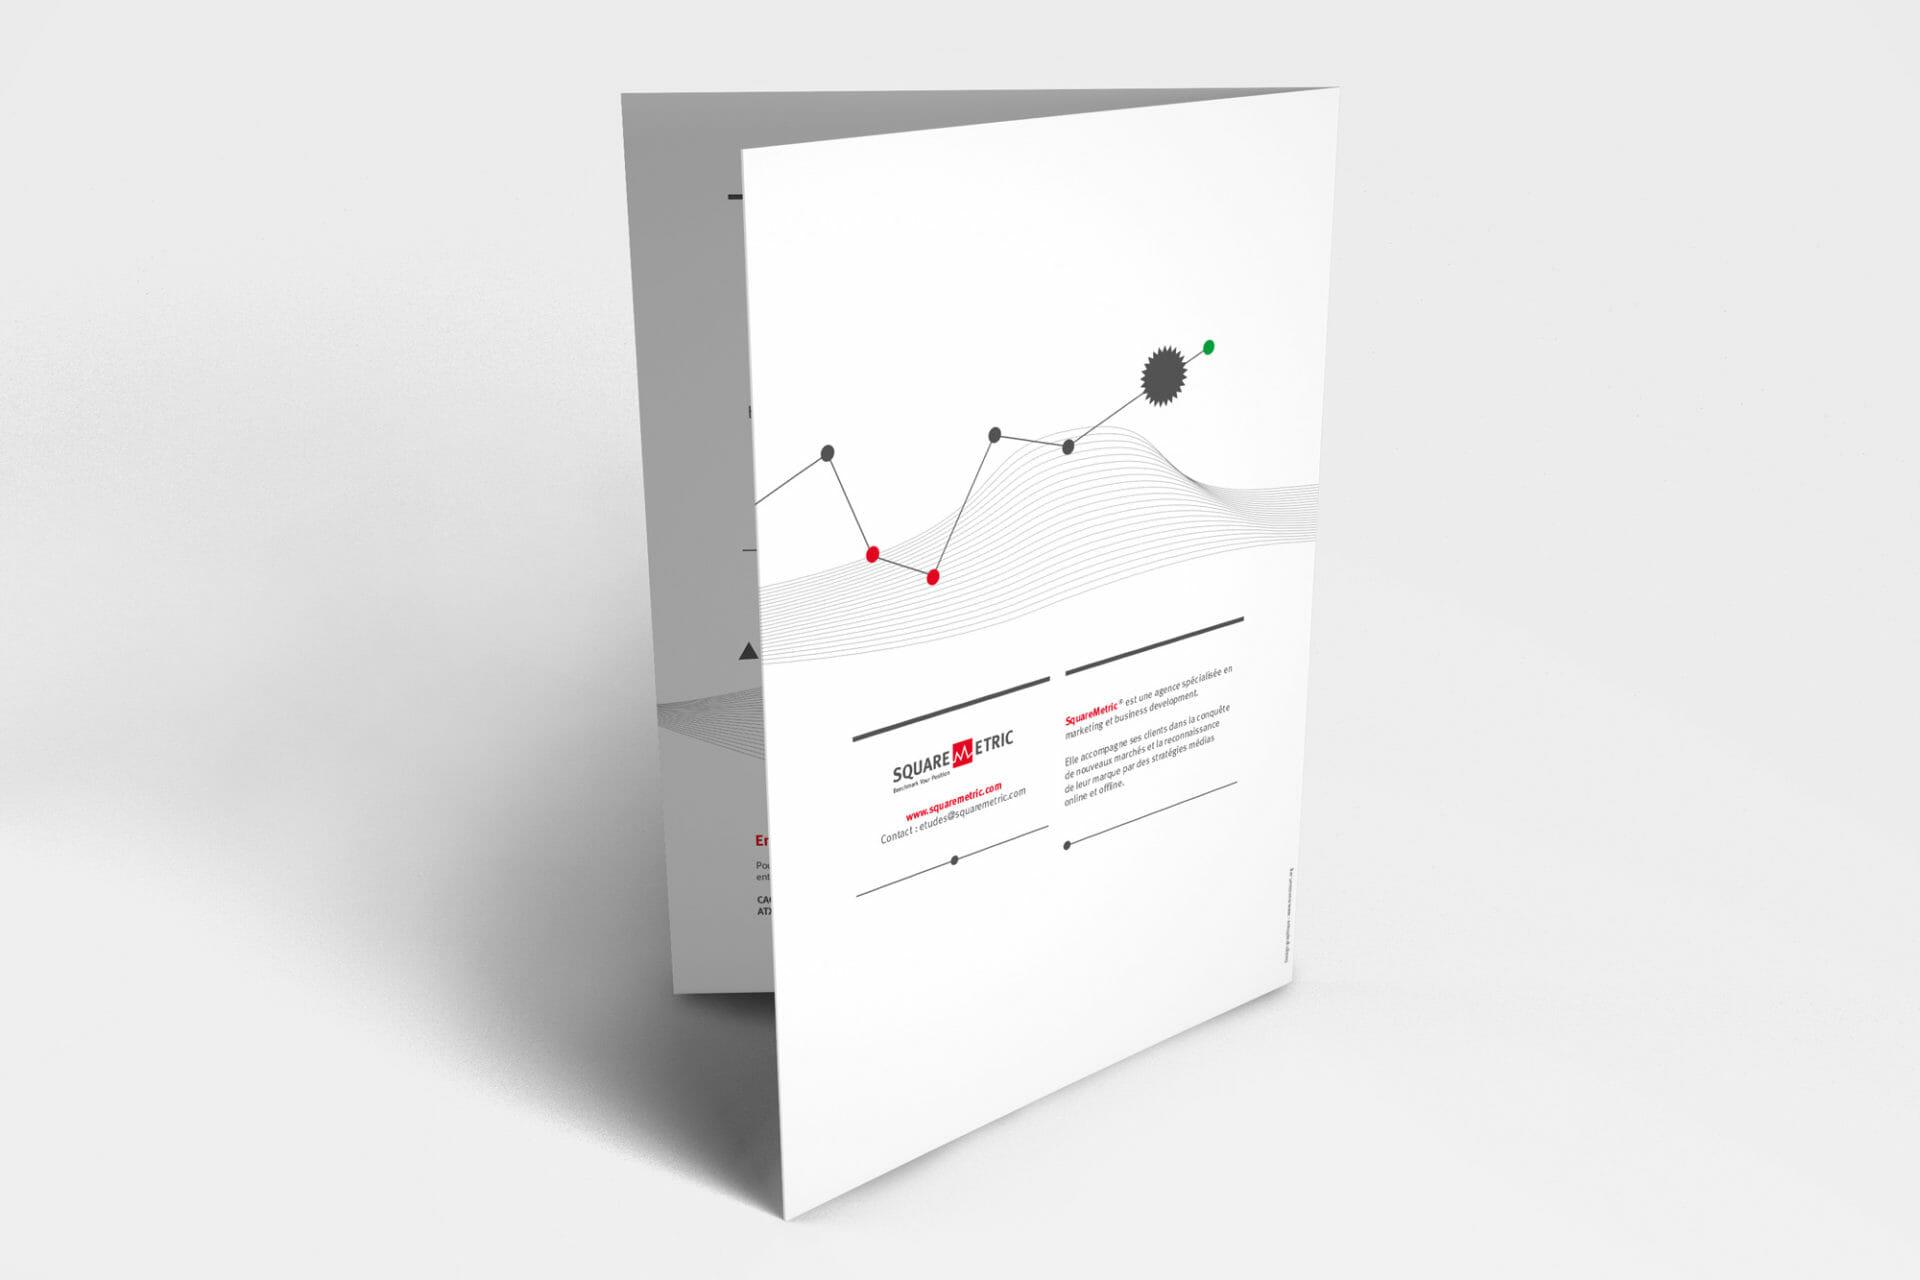 SquareMetric-book-4ecouv